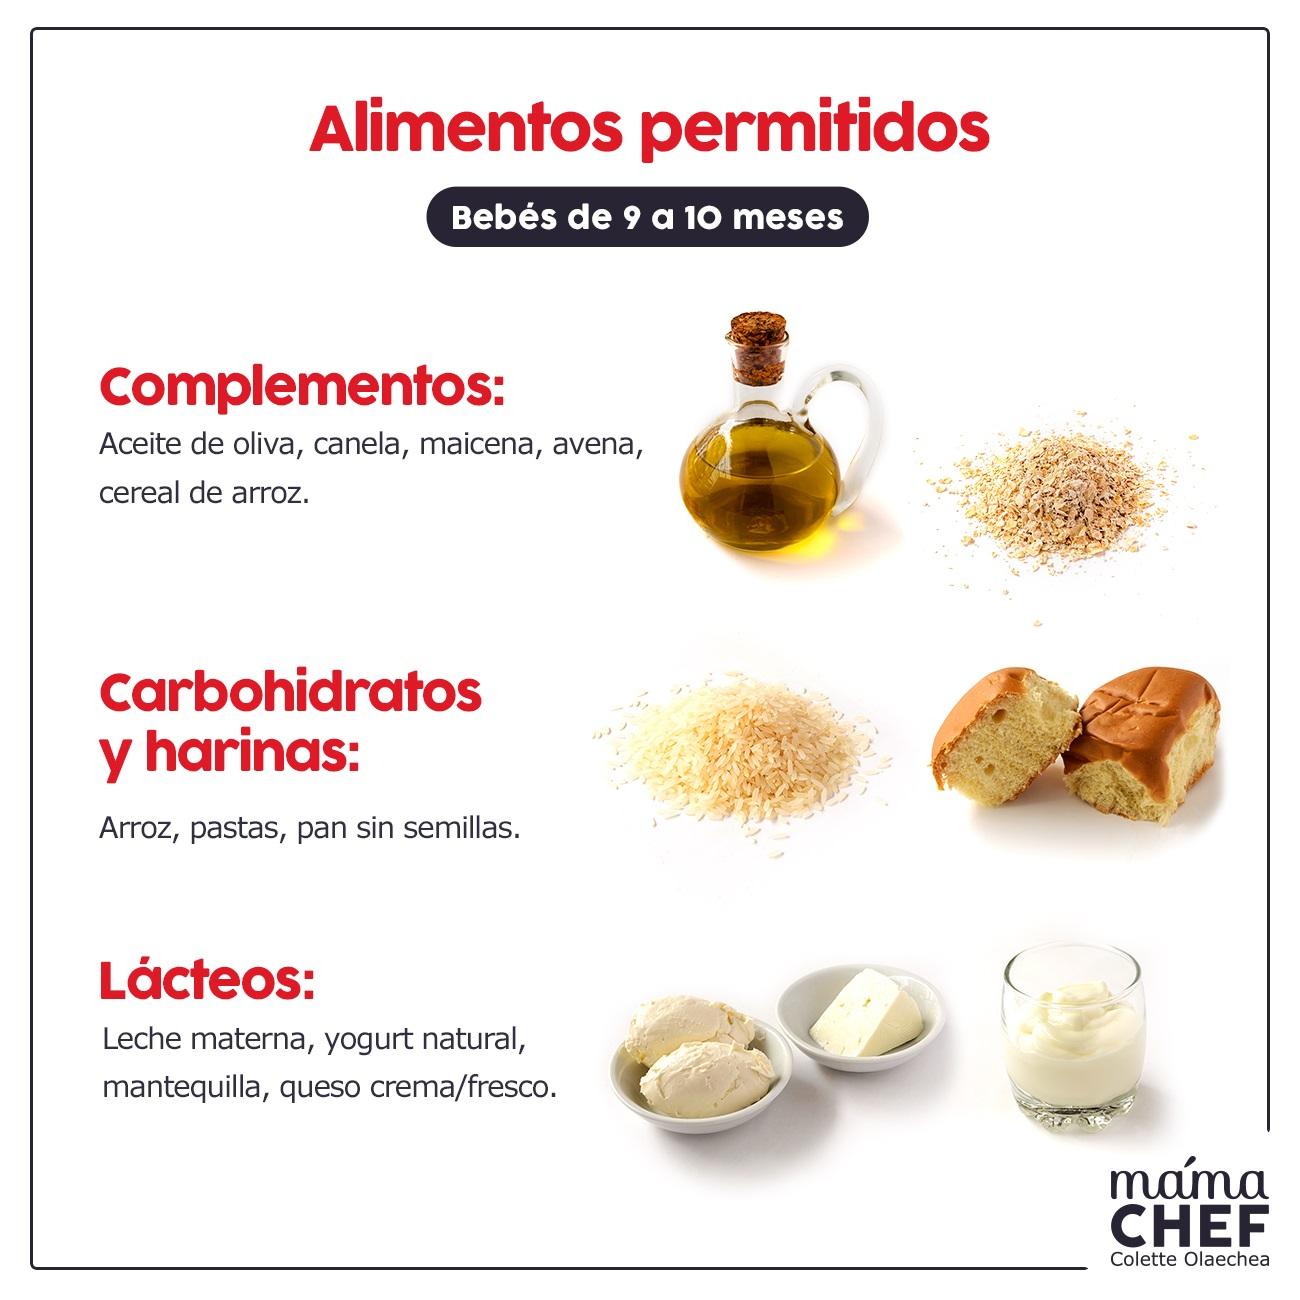 Alimentos permitidos y complementos 9 meses Mama Chef Colette Olaechea papillas